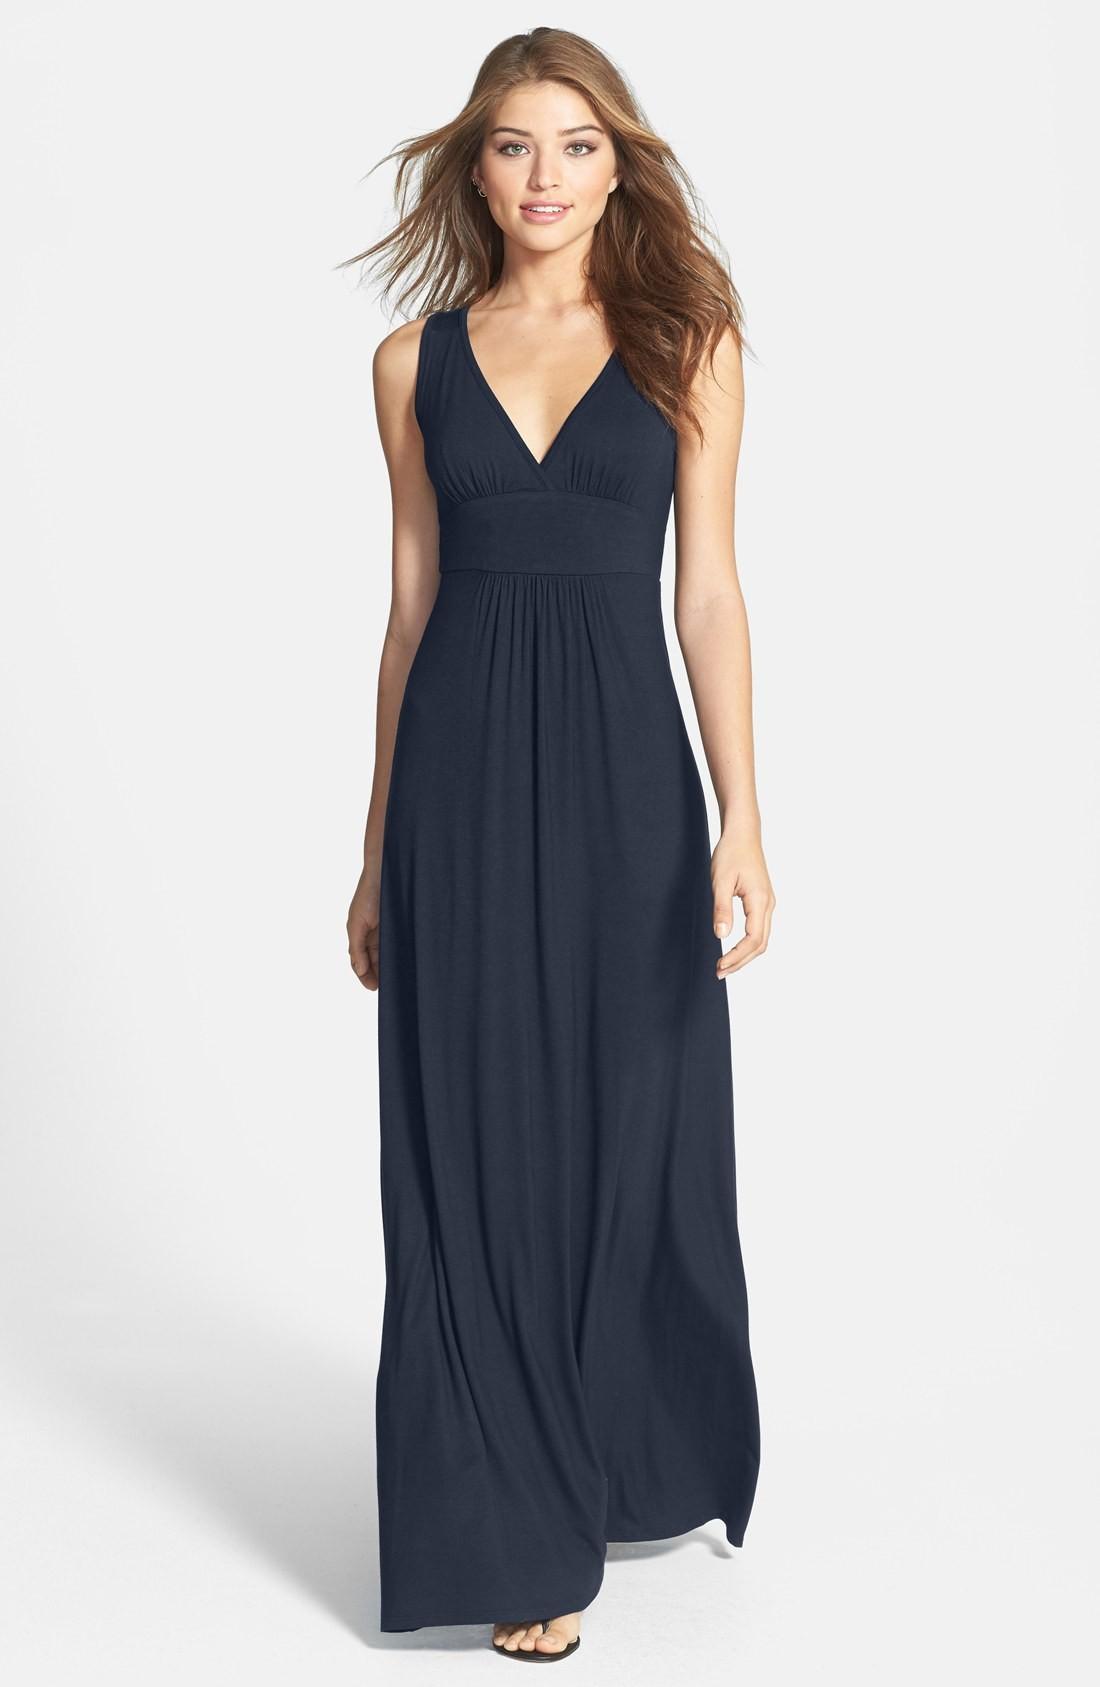 womens maxi dresses womenu0027s maxi dresses | nordstrom xdyawjz